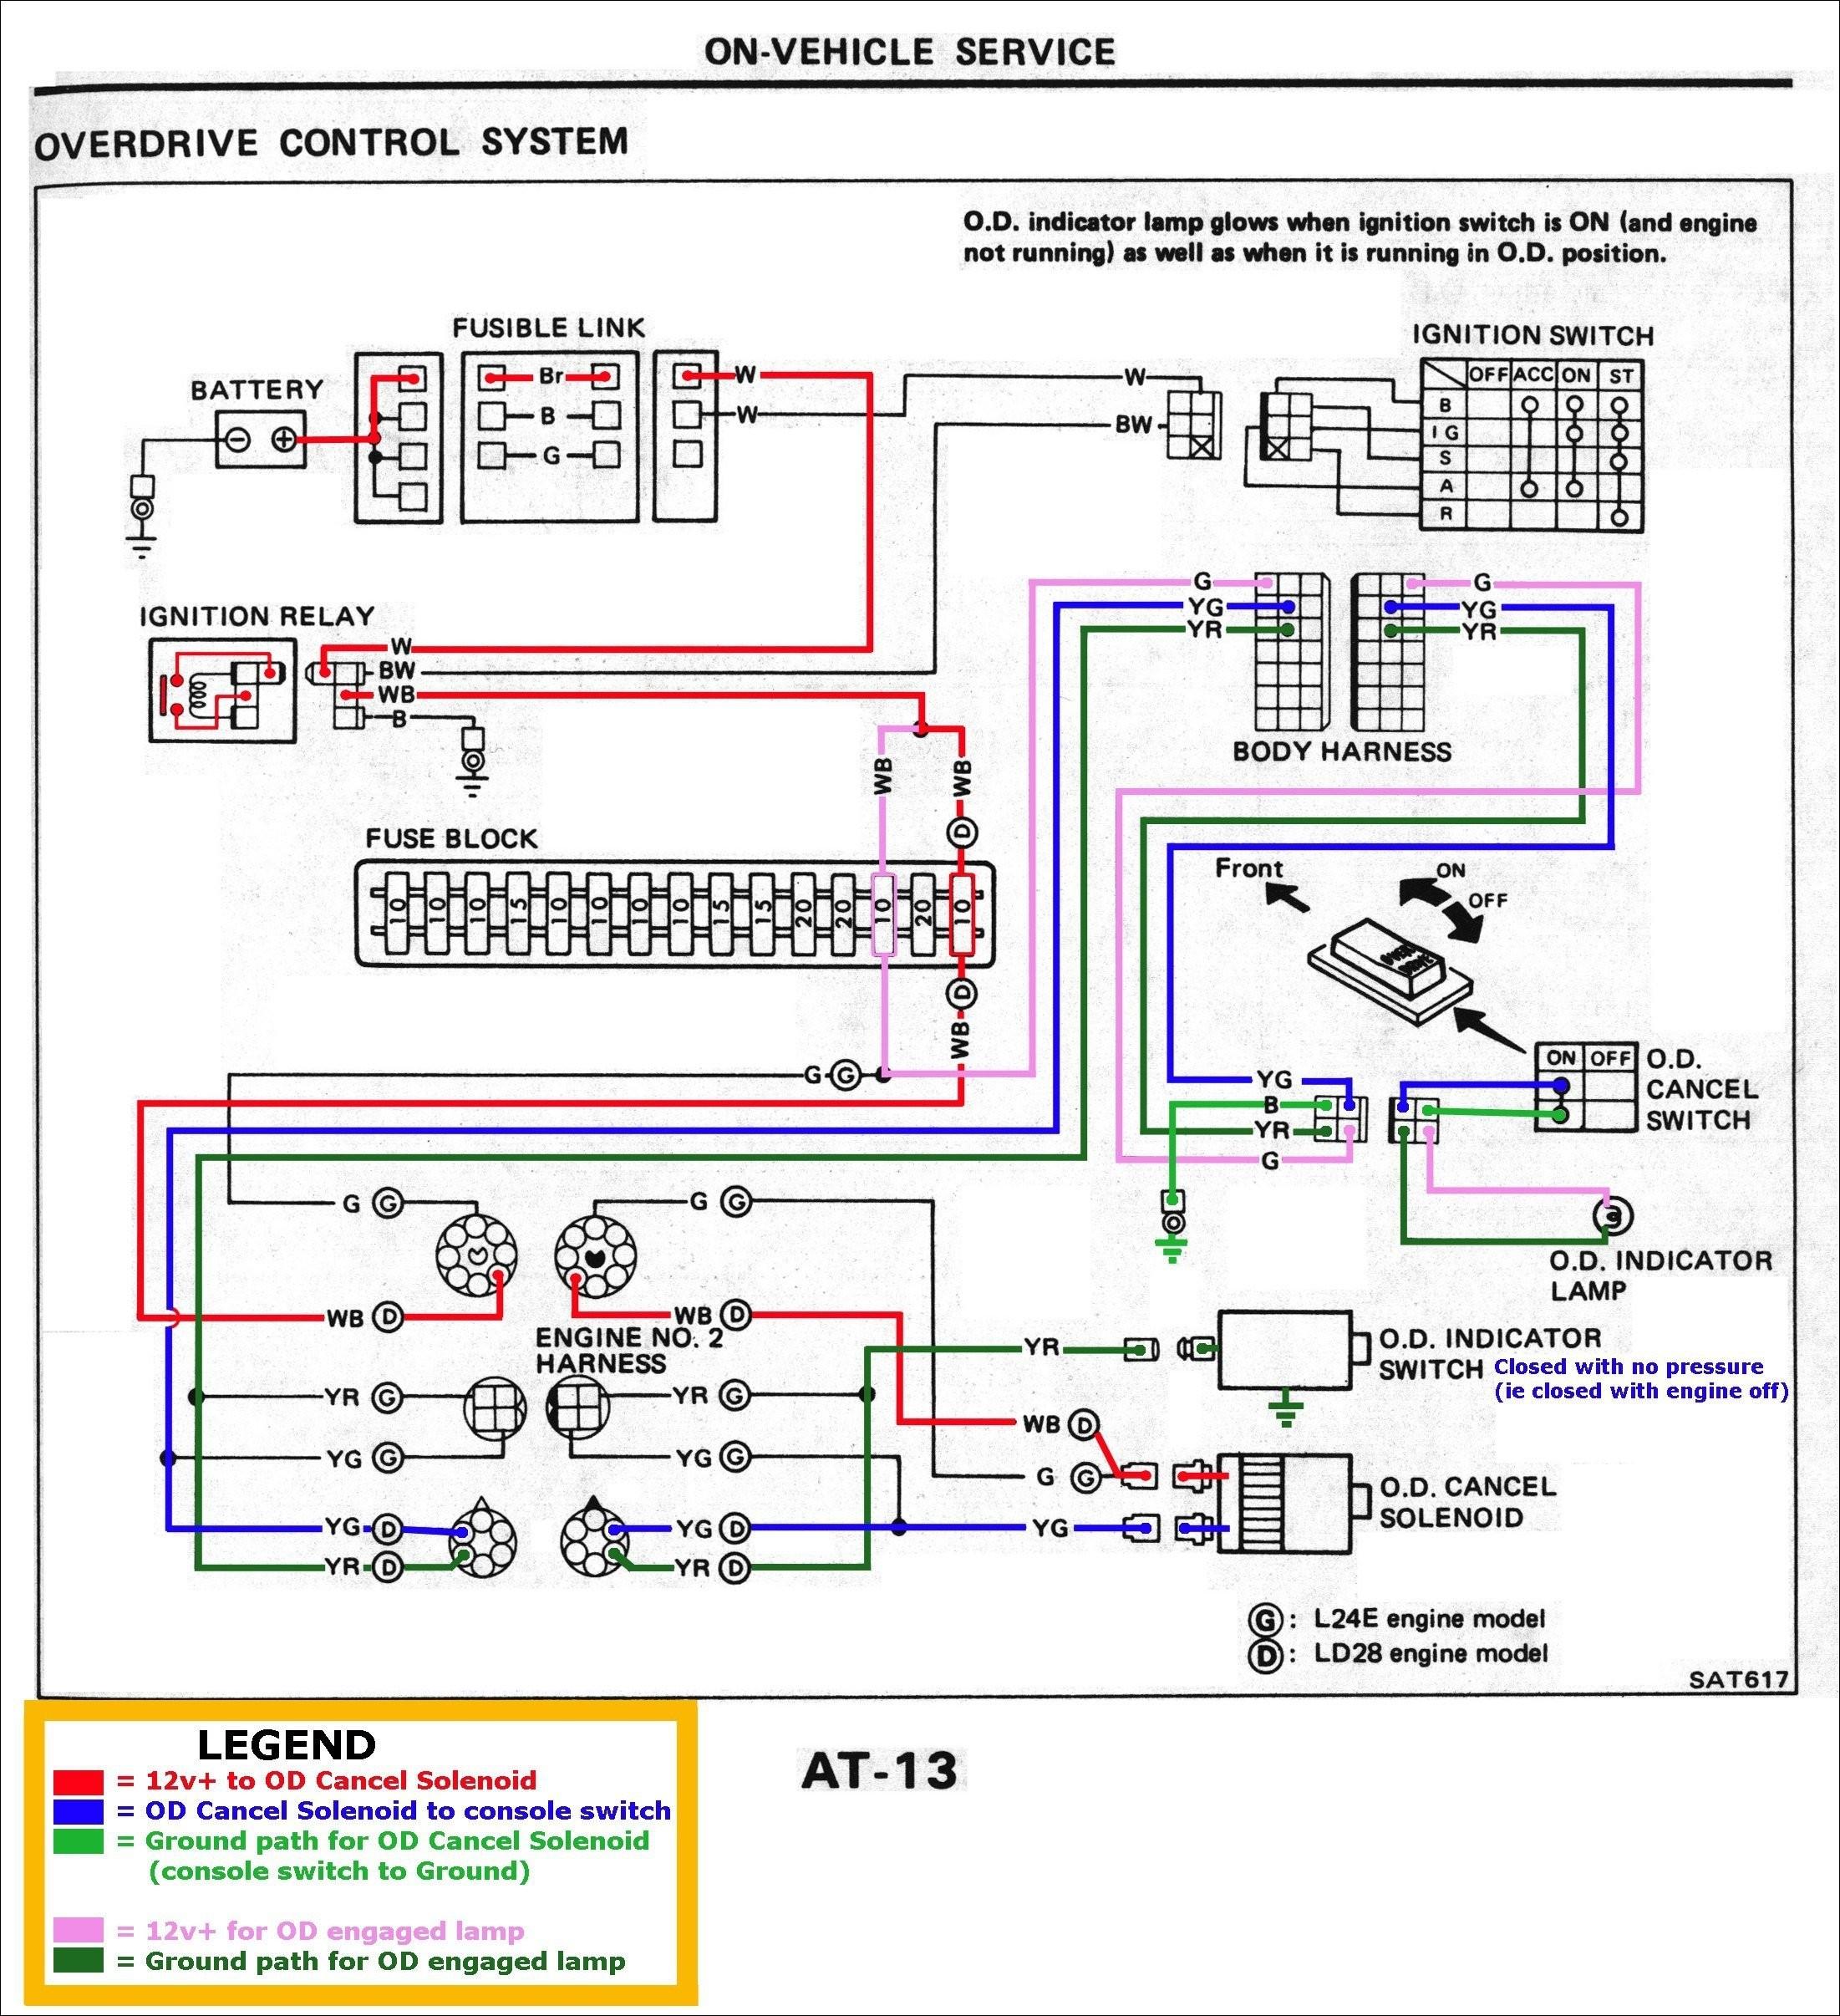 Brake Light Wiring Diagram Awesome Maxxima Light Wiring Diagram Best Brake Light Wiring Diagram